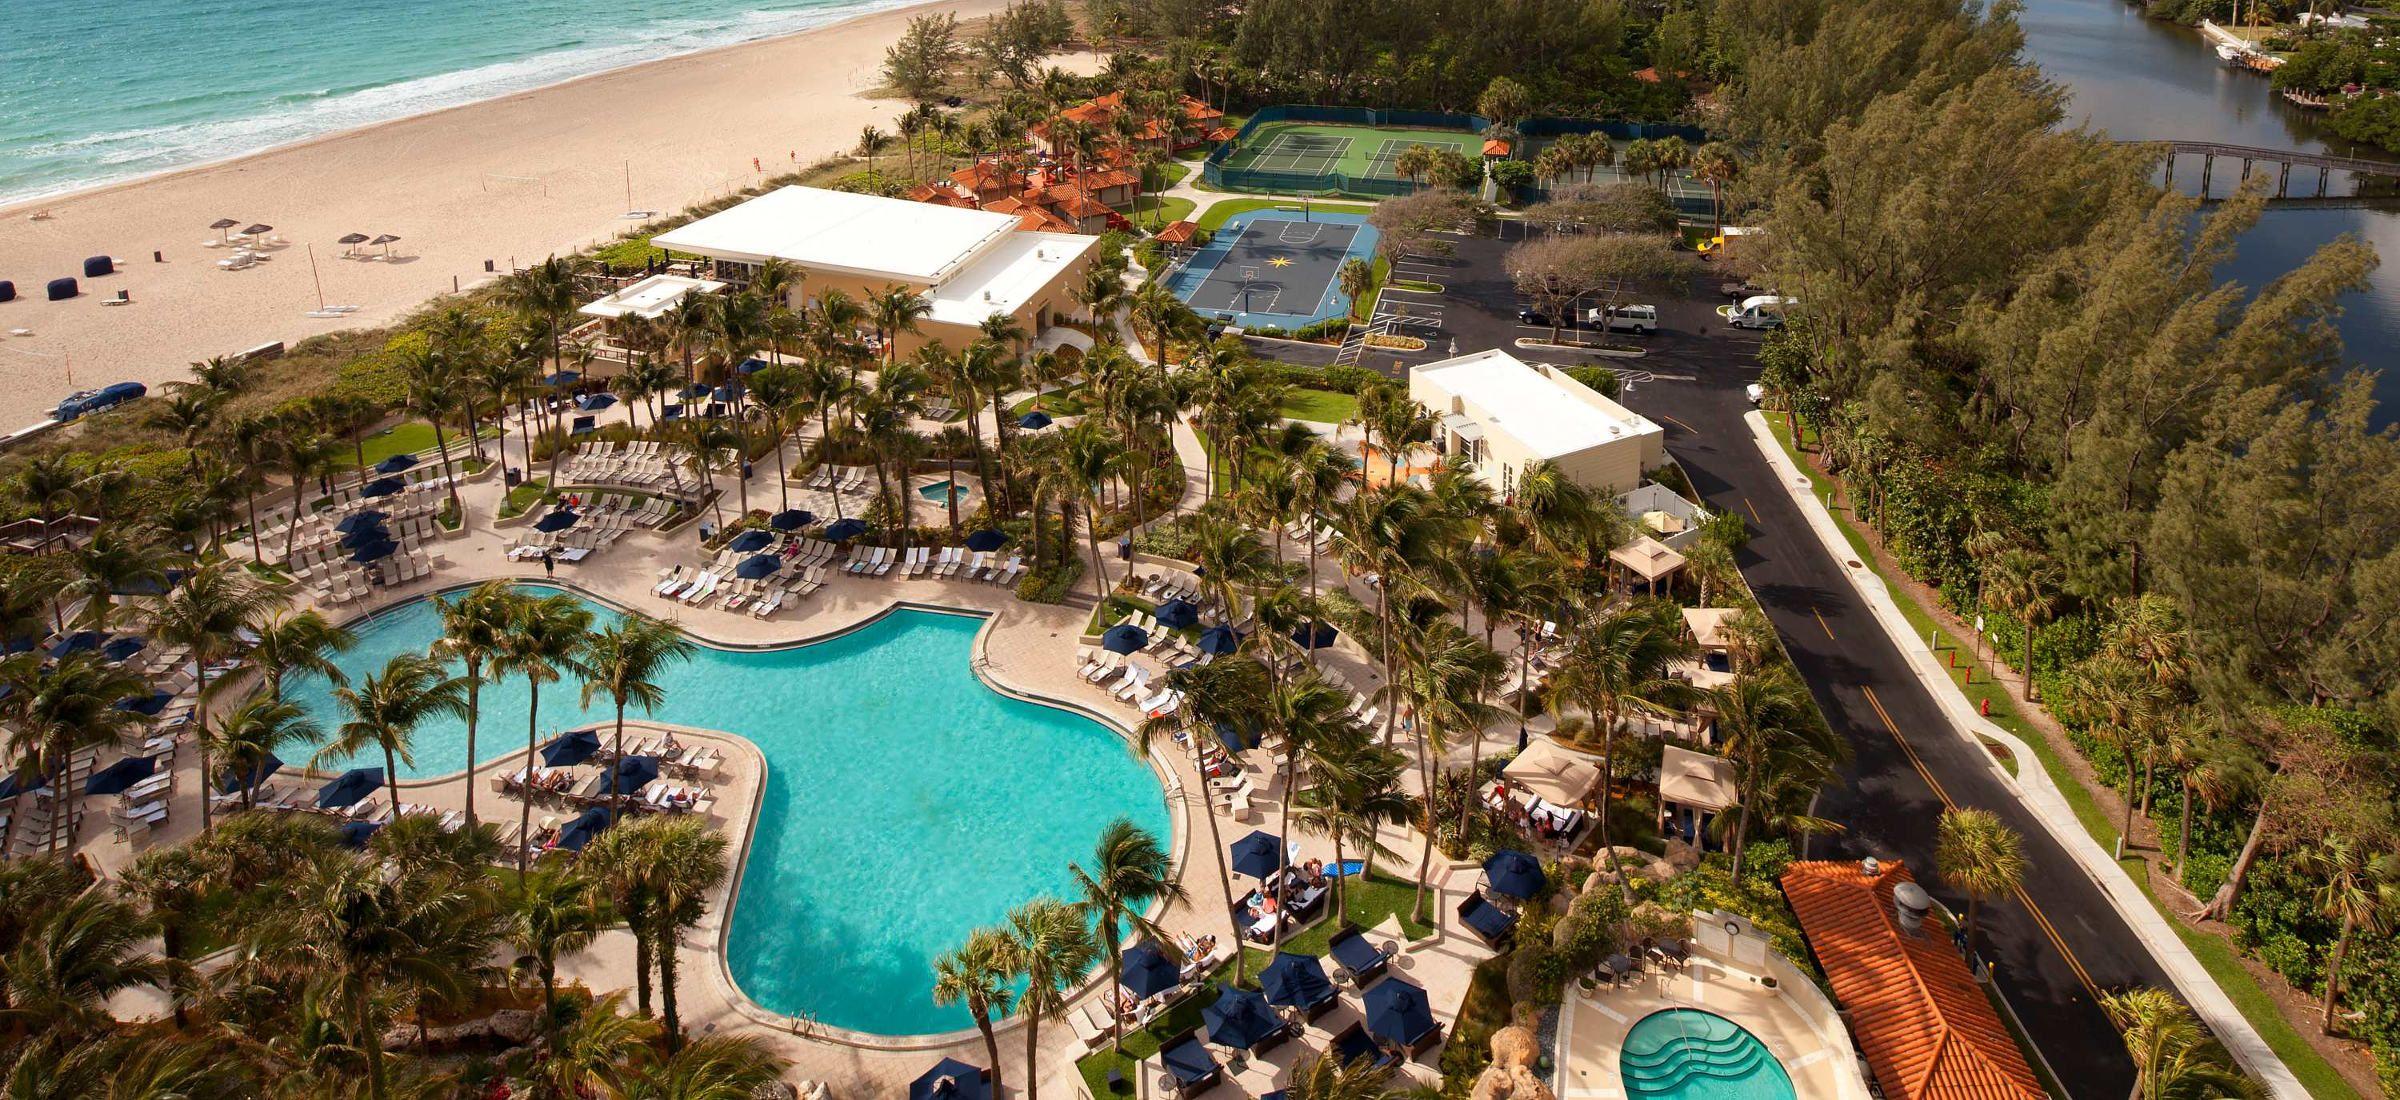 The Fort Lauderdale Marriott Harbor Beach Resort Spa Features